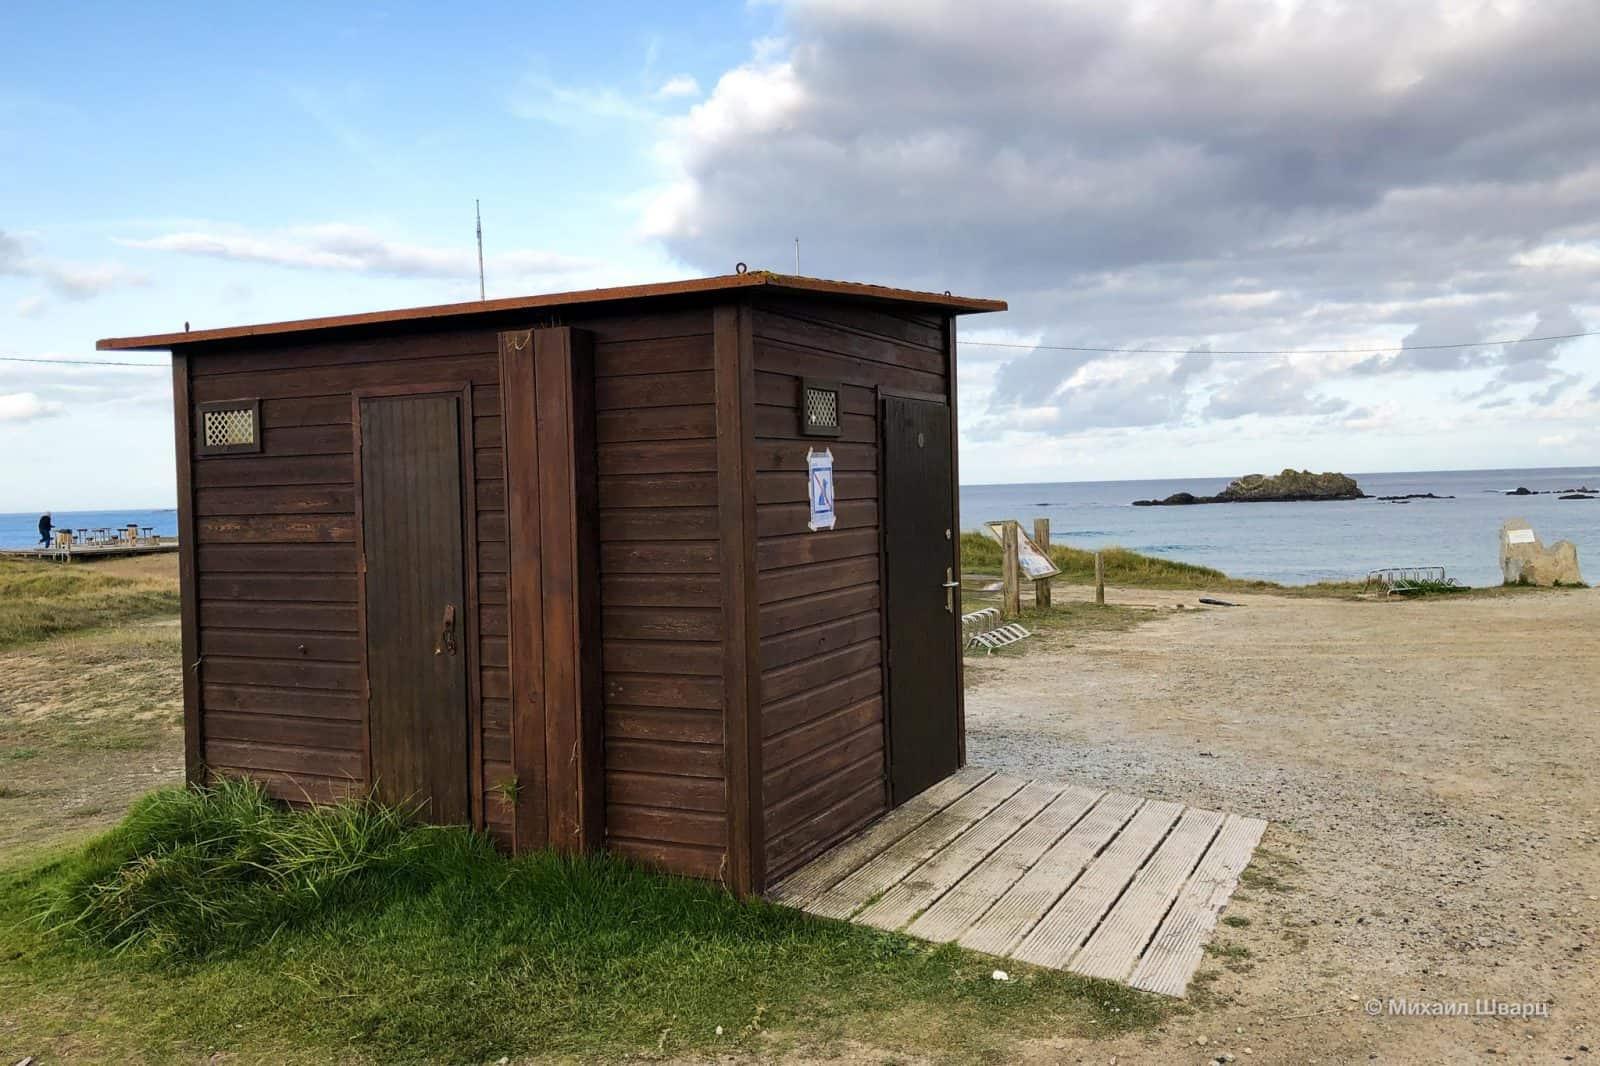 Пляжный туалет